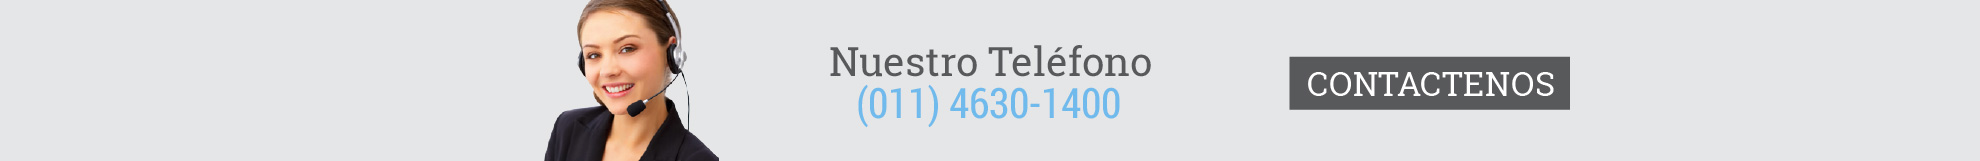 banner_tel1 Contacto